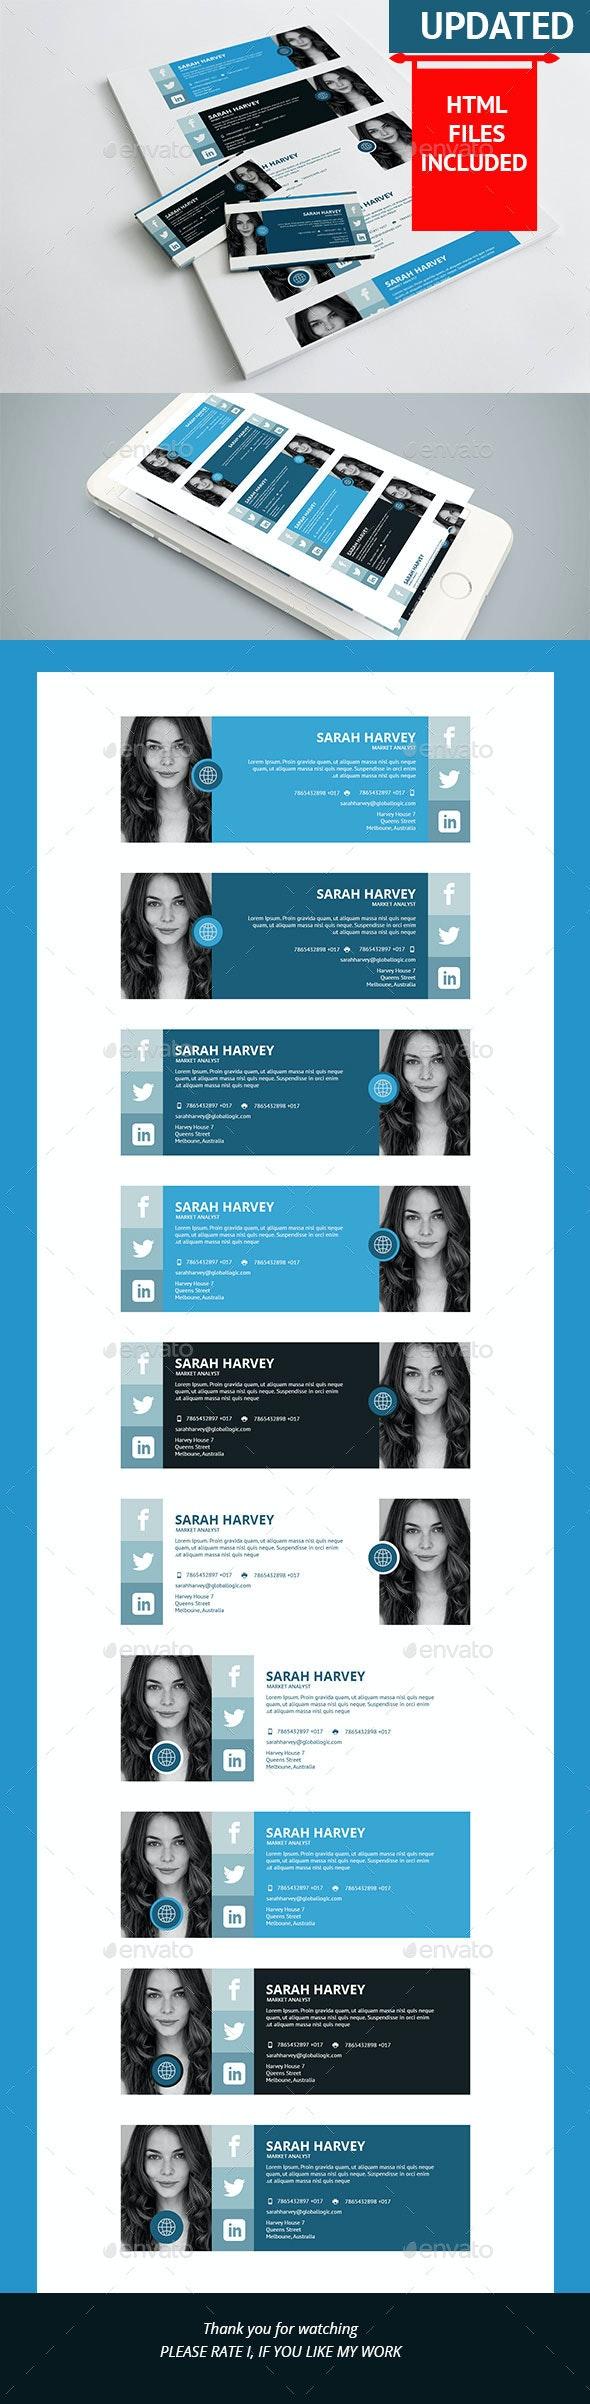 10 Corporate E-Signature PSD+HTML Template - Miscellaneous Social Media